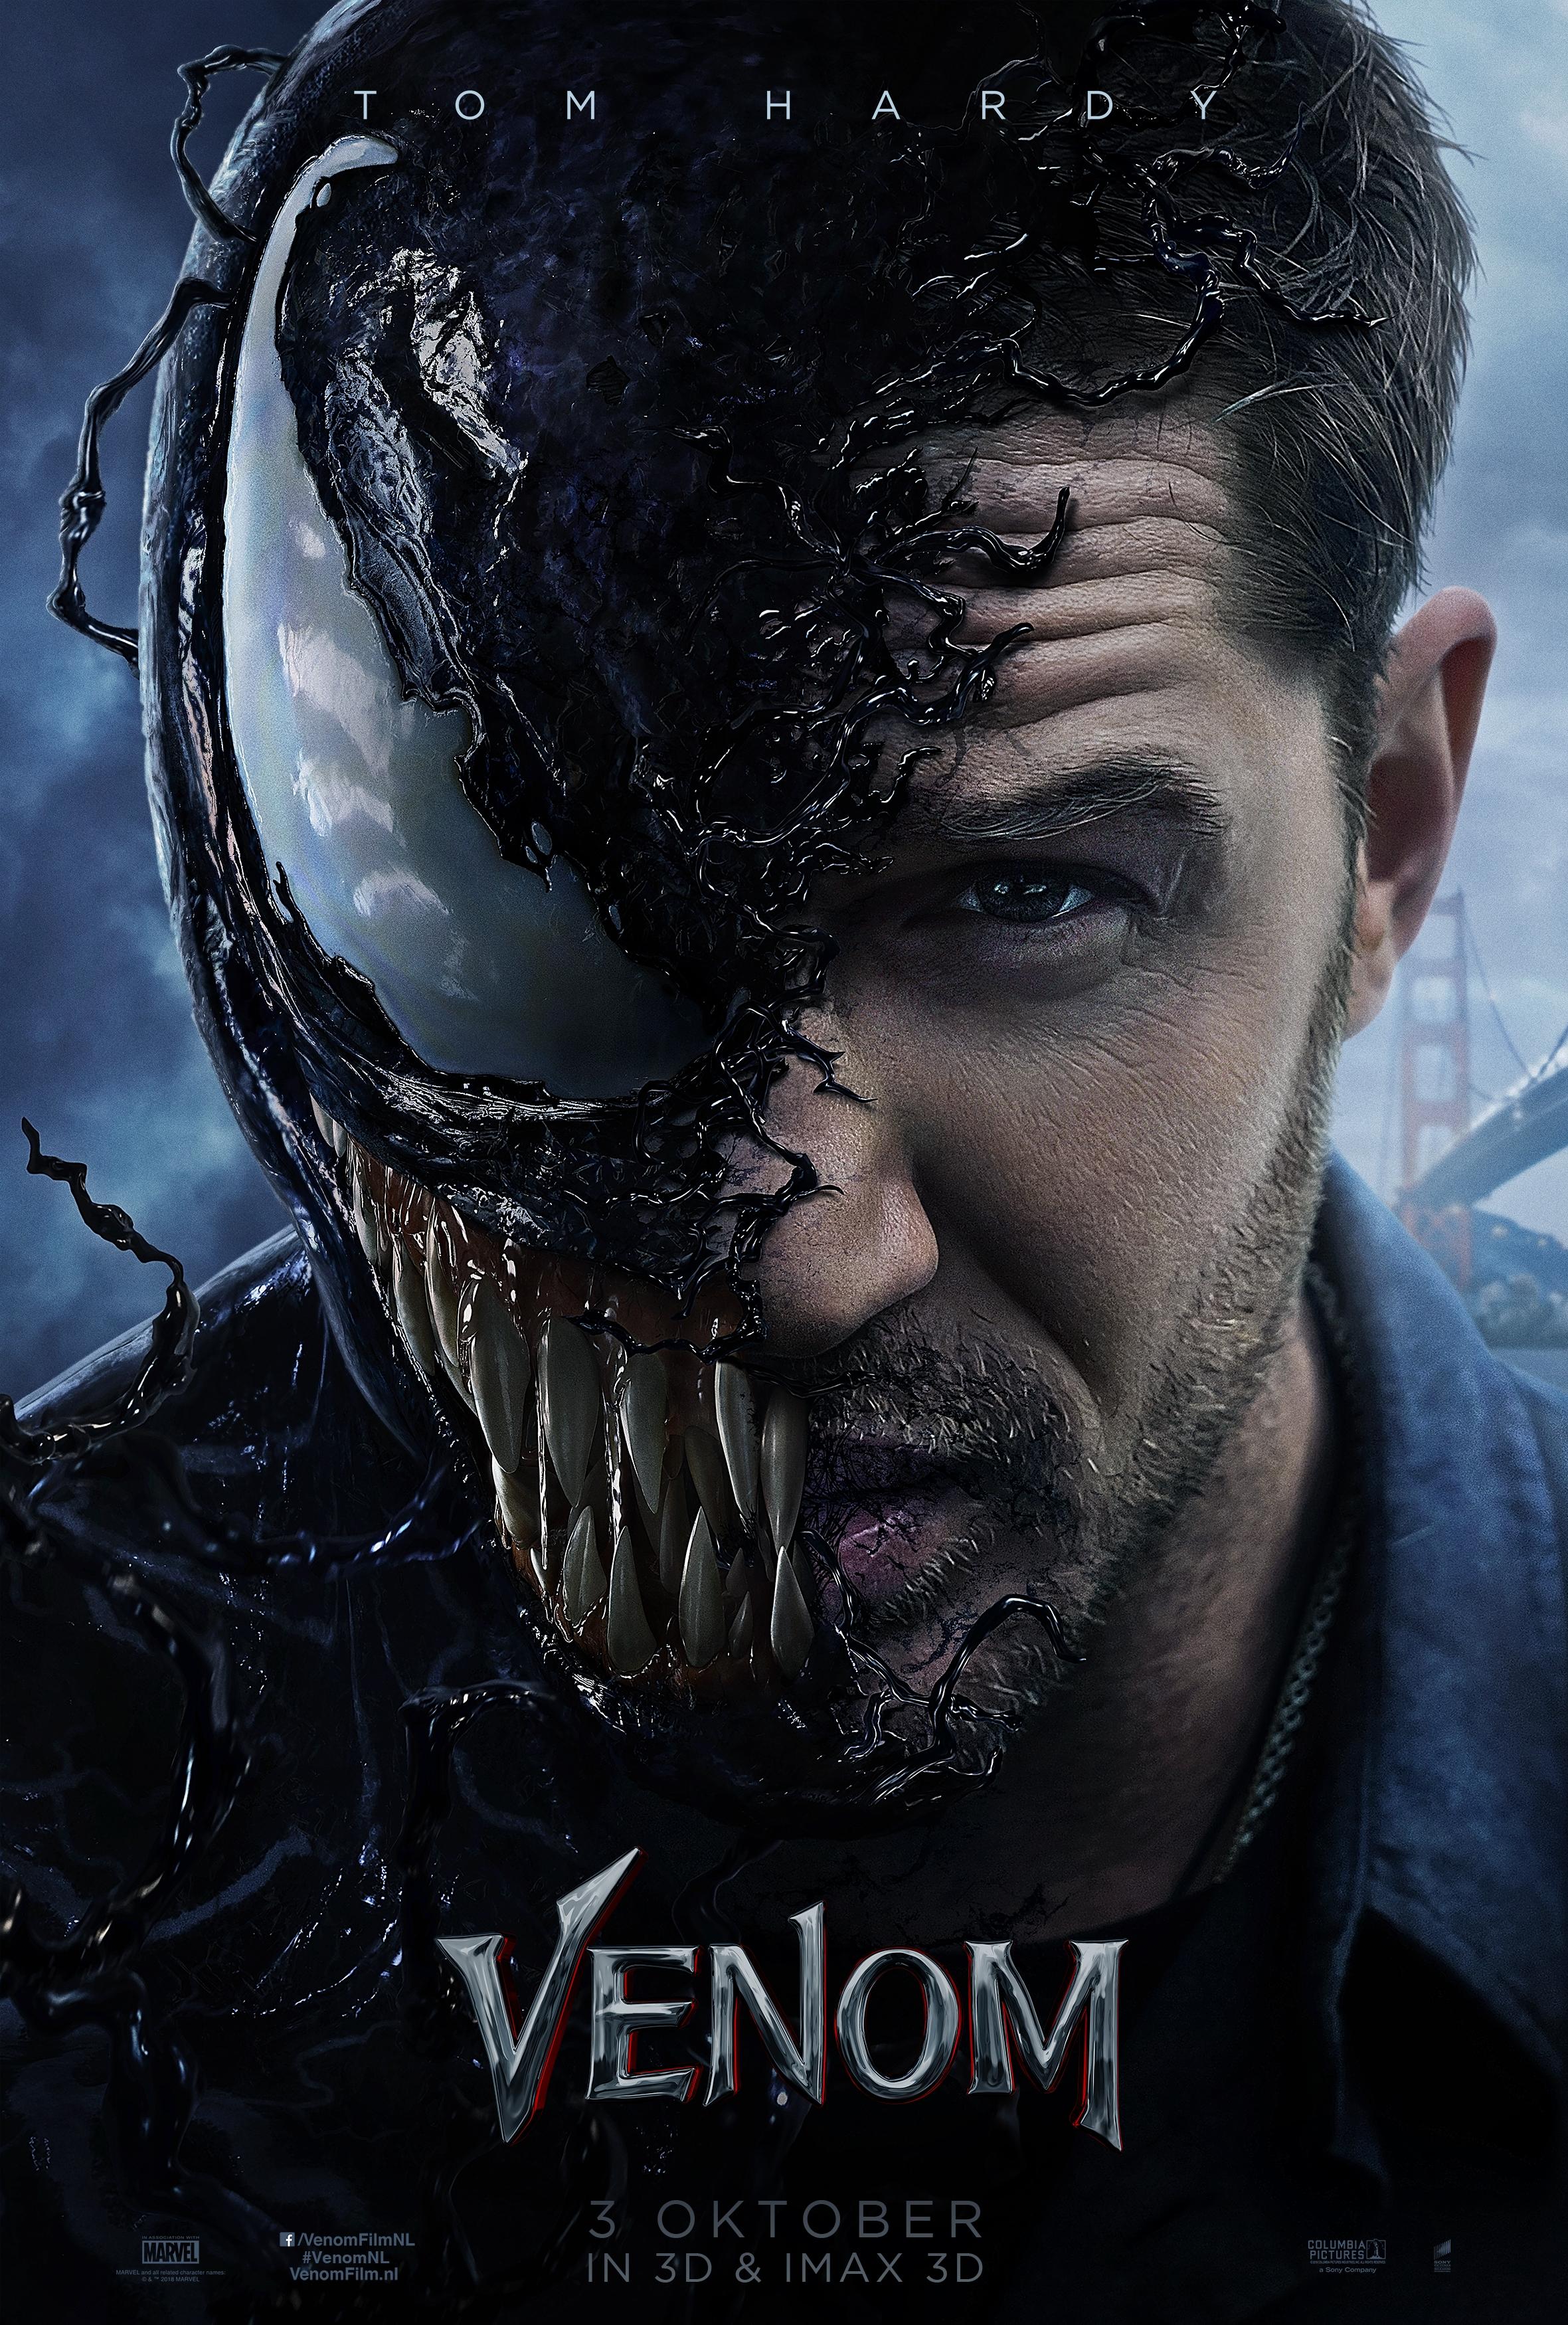 Venom poster, © 2018 Universal Pictures International